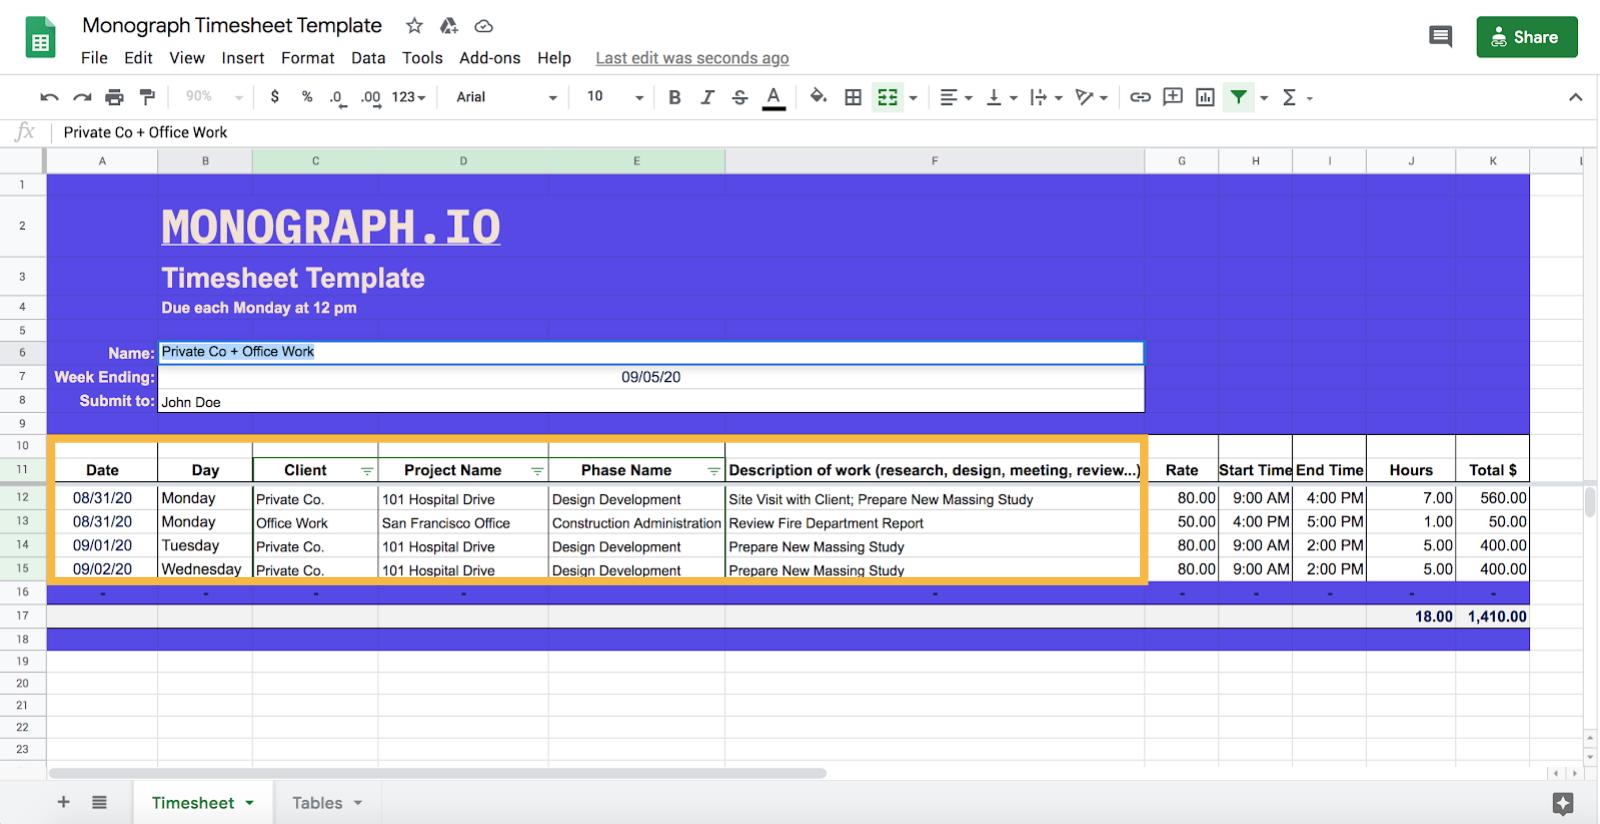 architect timesheet template information